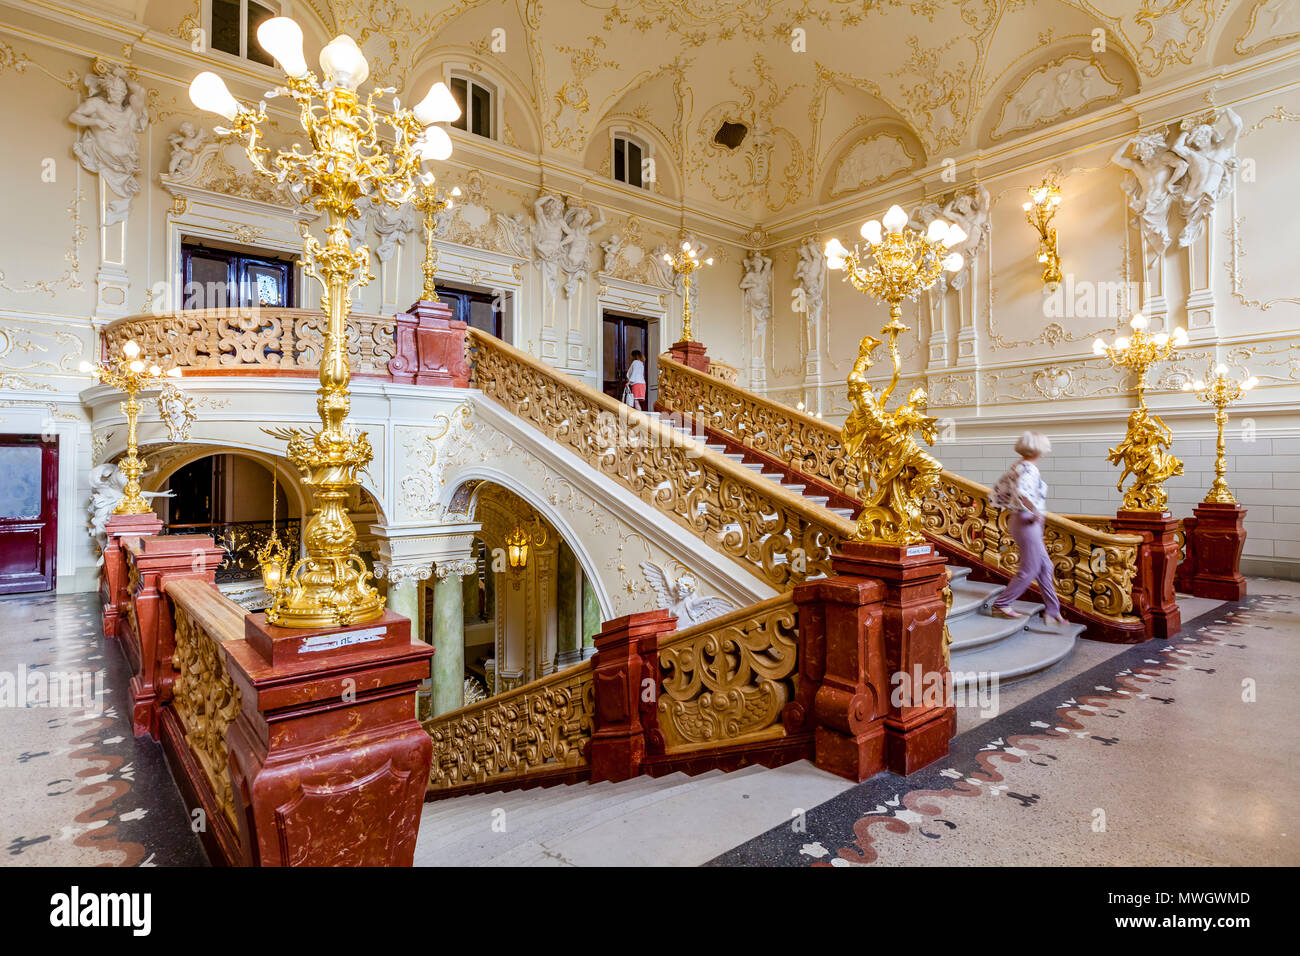 The Odessa National Academic Theatre of Opera and Ballet, Odessa, Ukraine - Stock Image